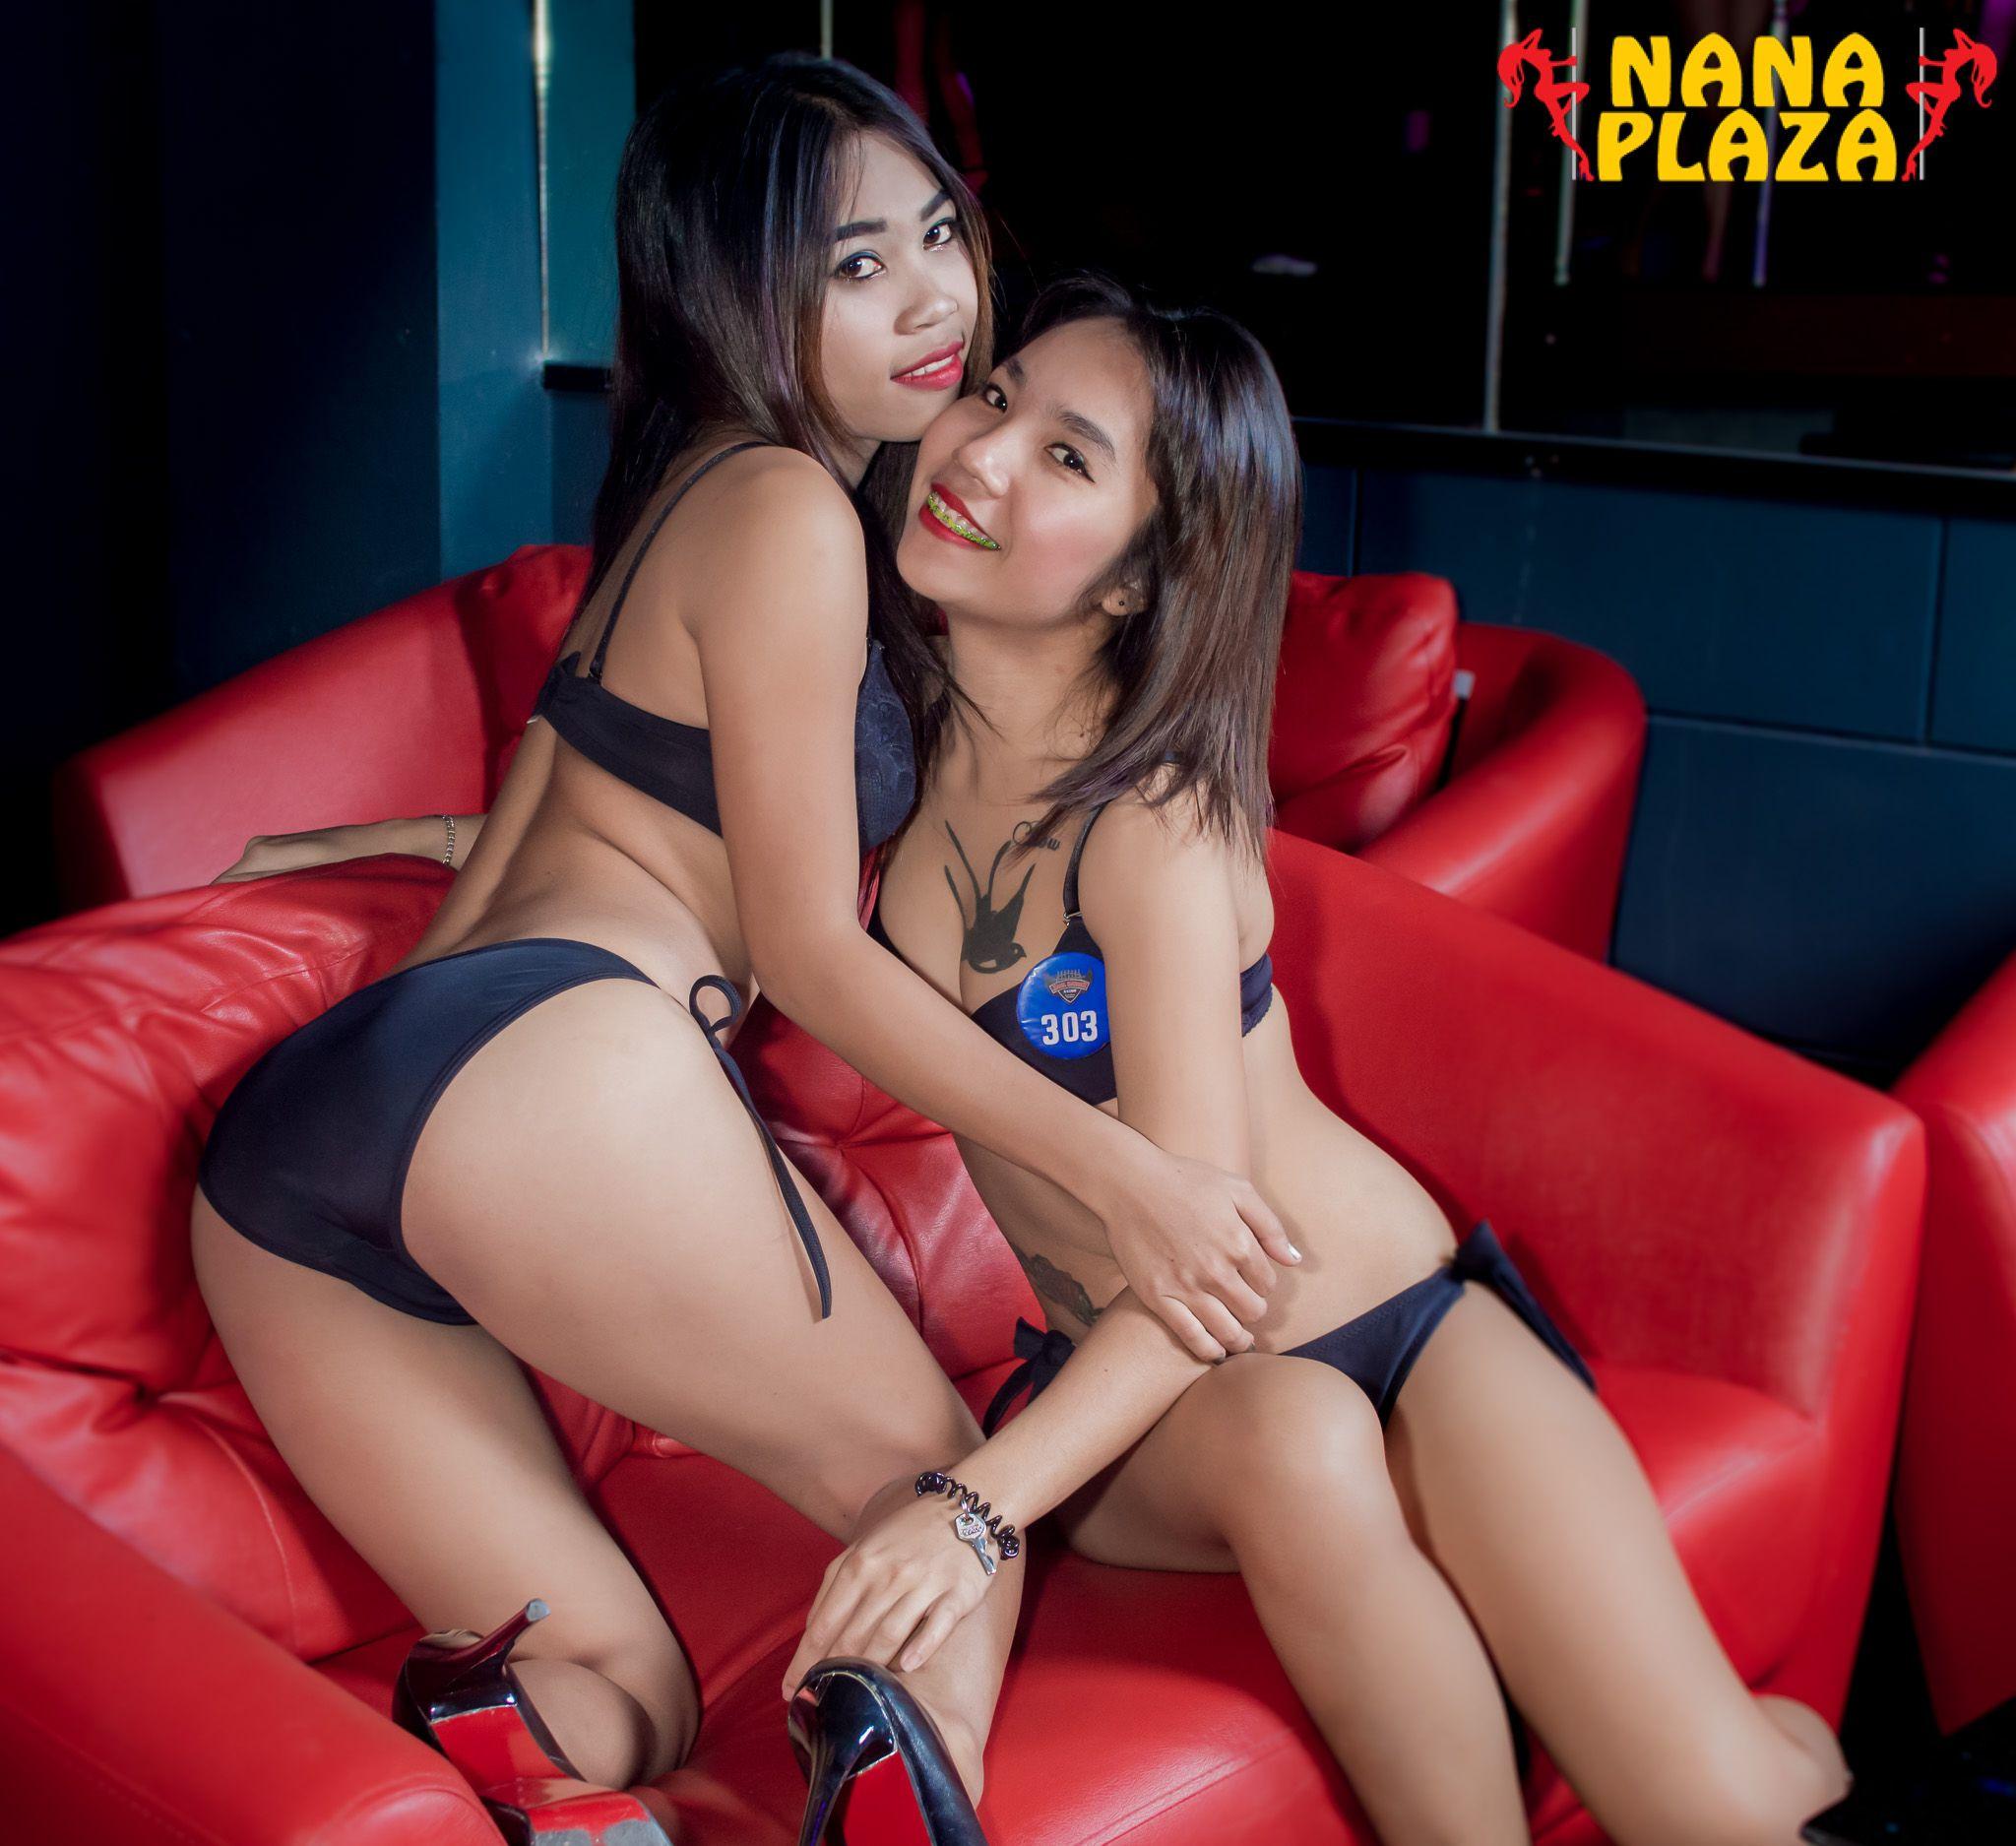 Thai woman for uk stripper